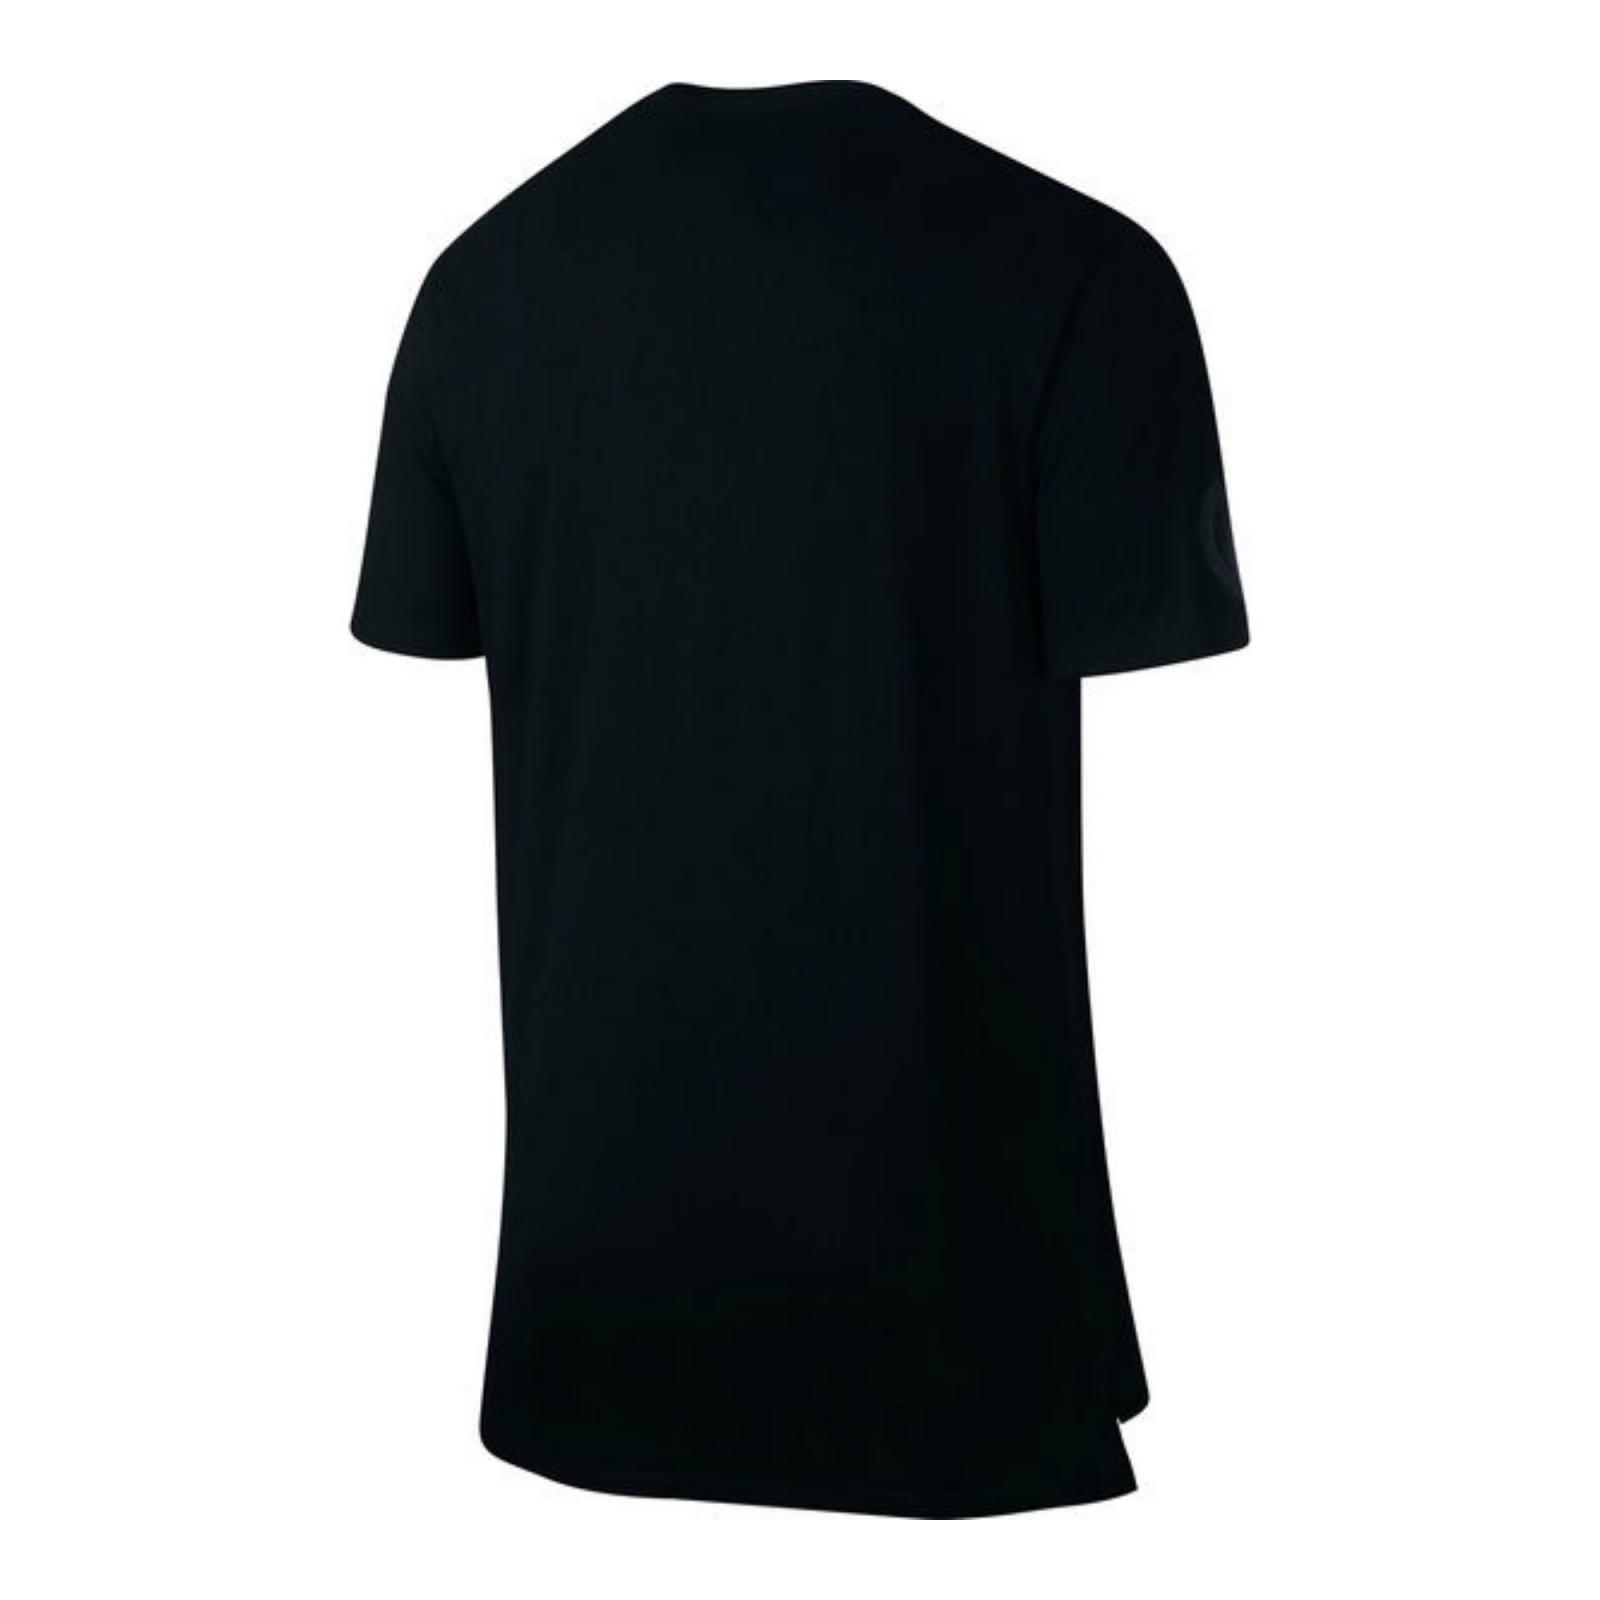 d1586a938432 Team Usa Nike Dri Fit Athlete T Shirt - BCD Tofu House